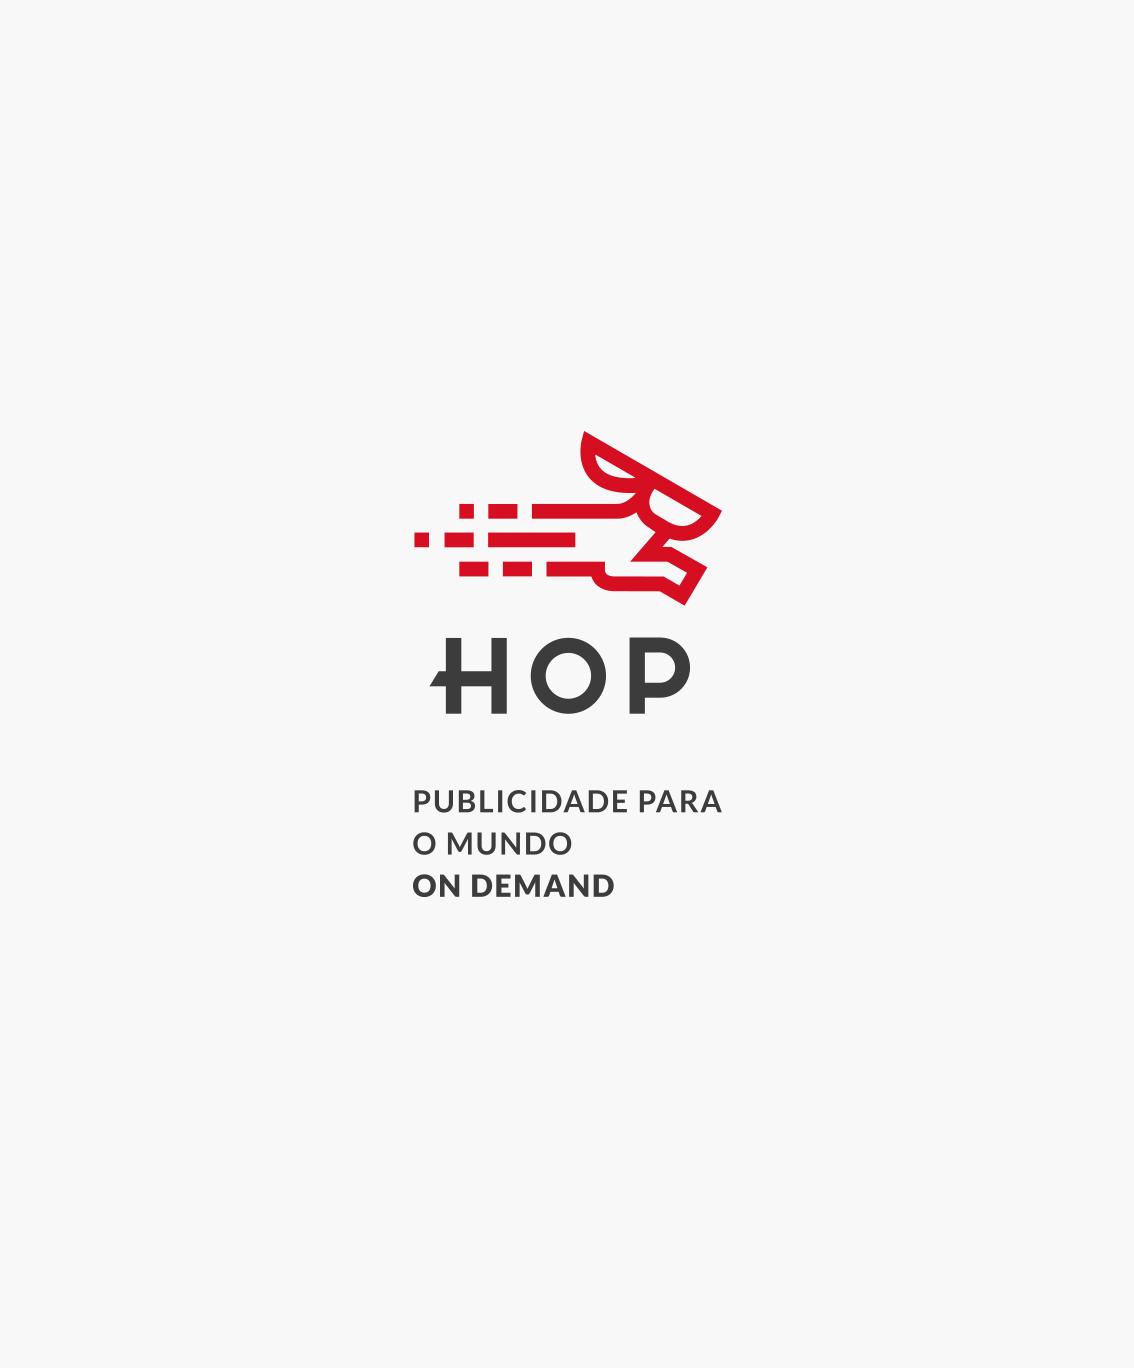 HOP logo by João Pedro Rimenzoski. It's a smart, fast and technological rabbit.